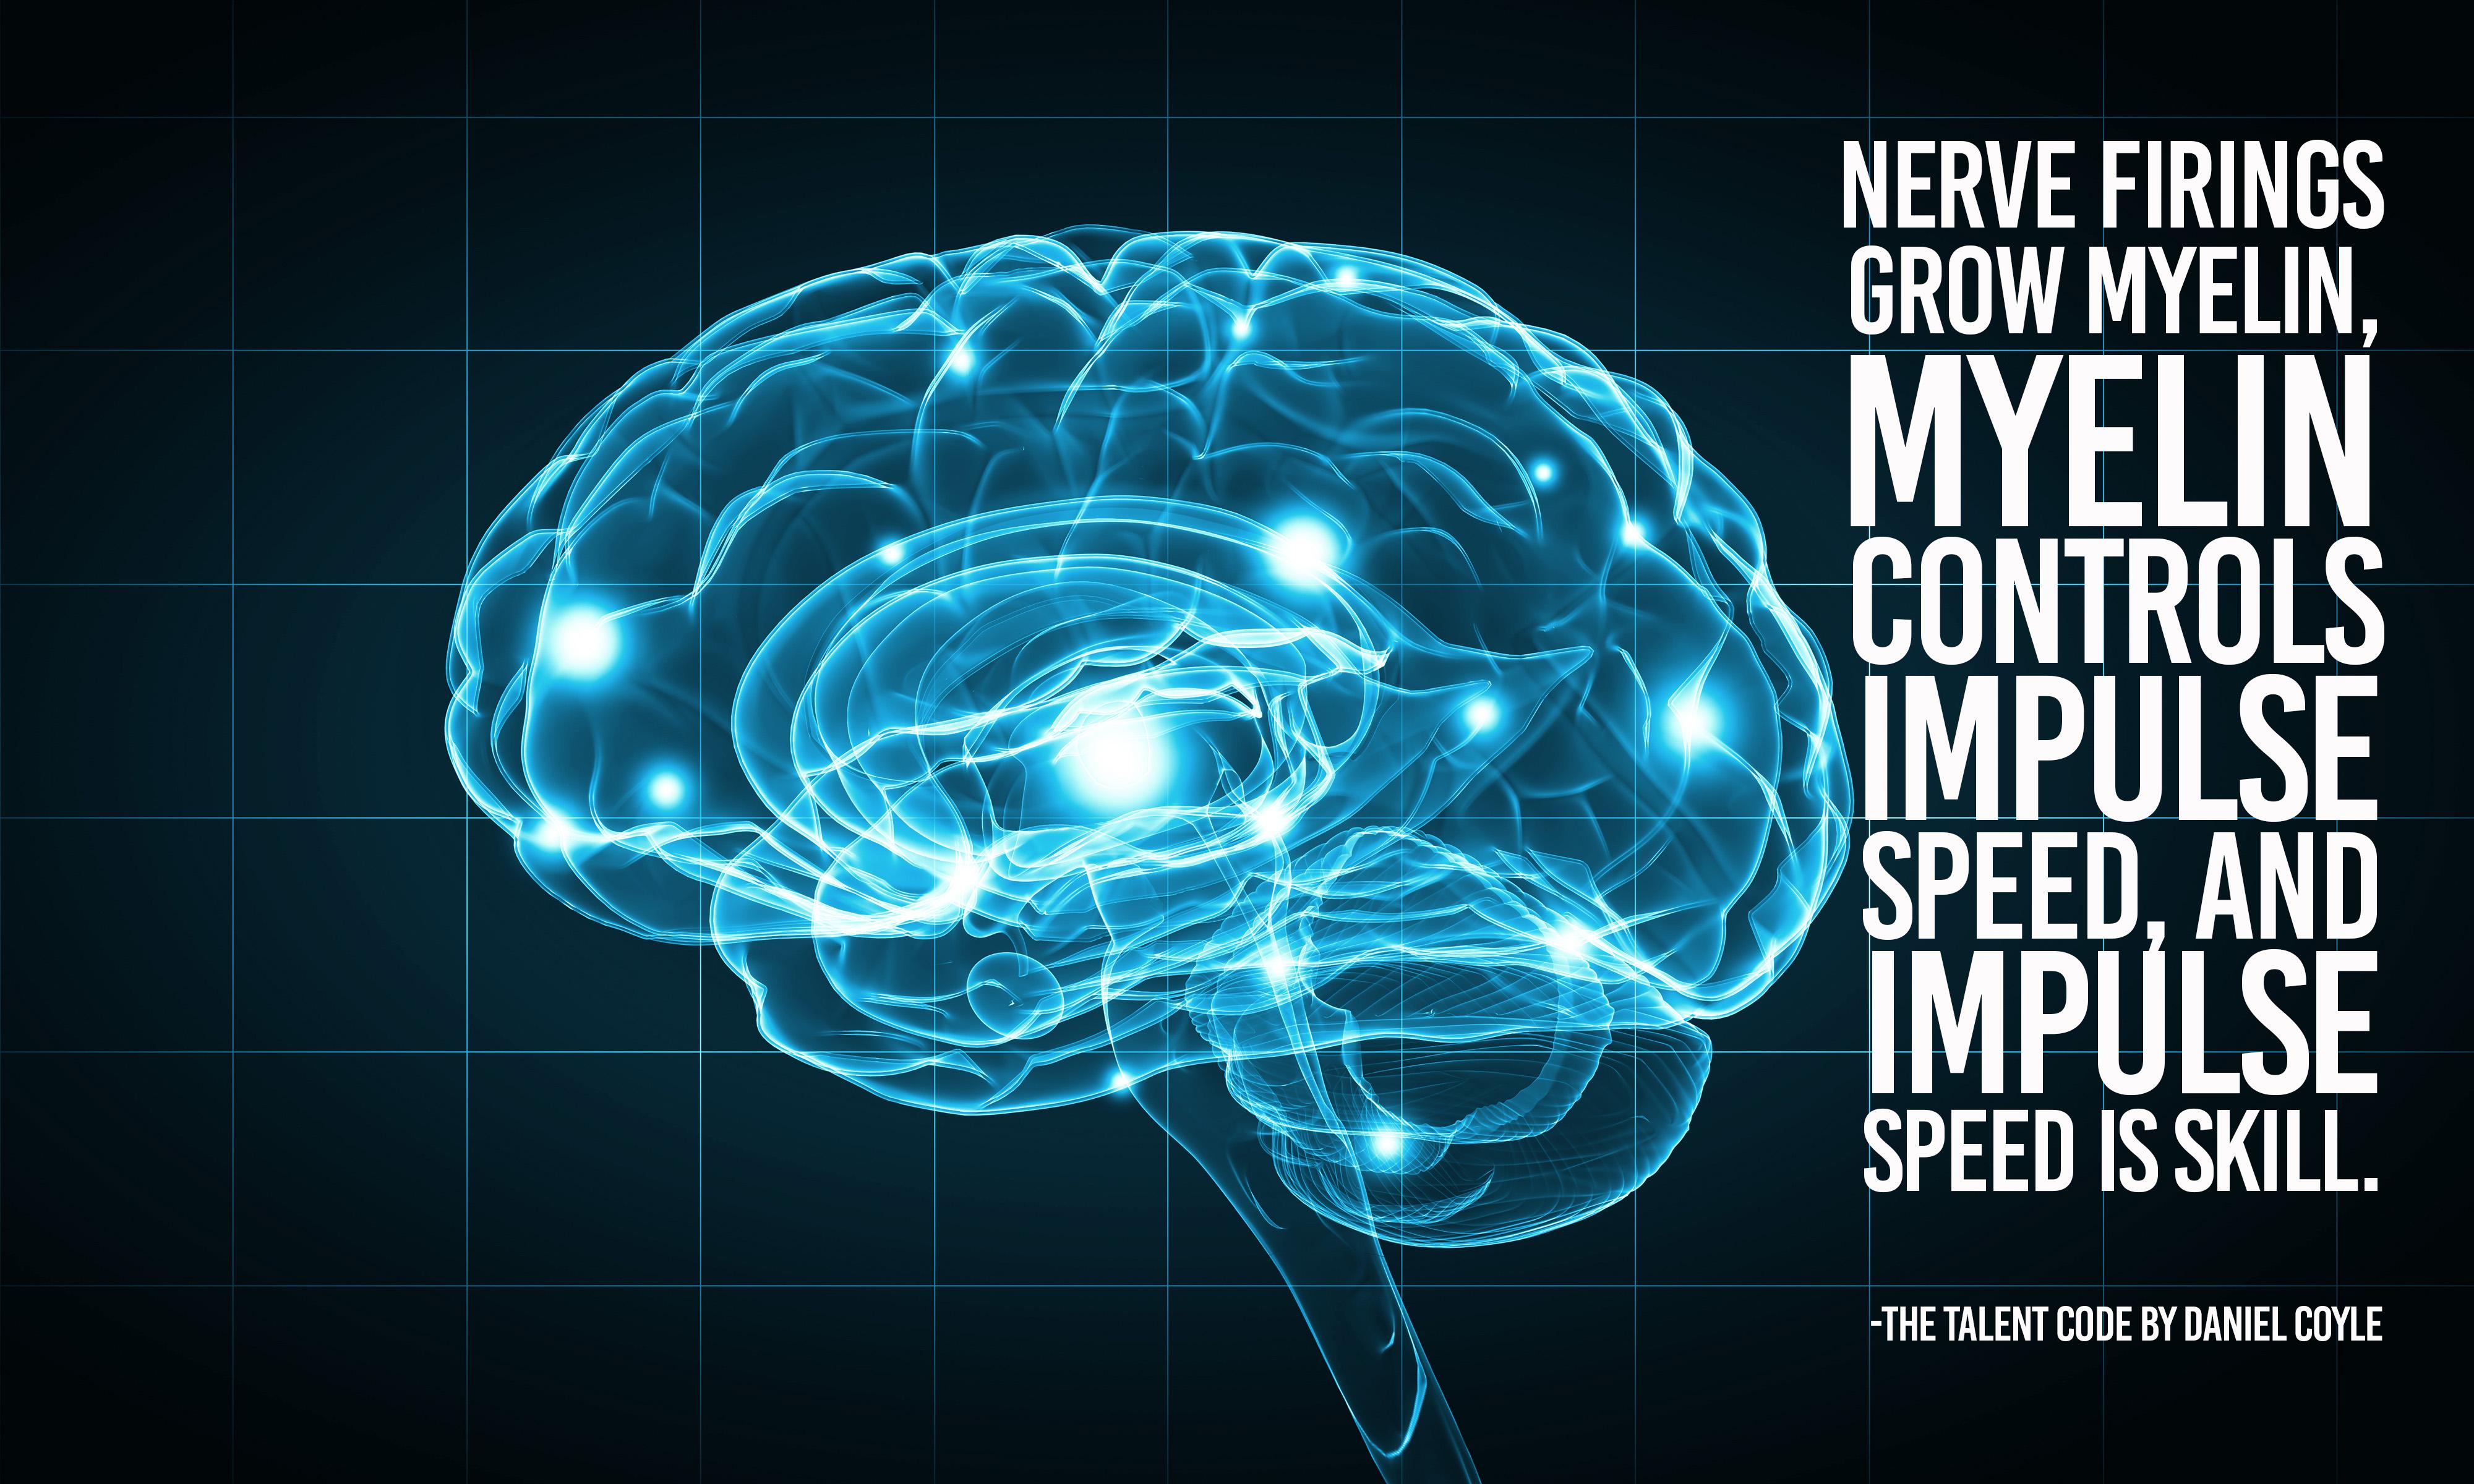 nerve firings grow myelin myelin controls impulse speed and impulse speed is skill